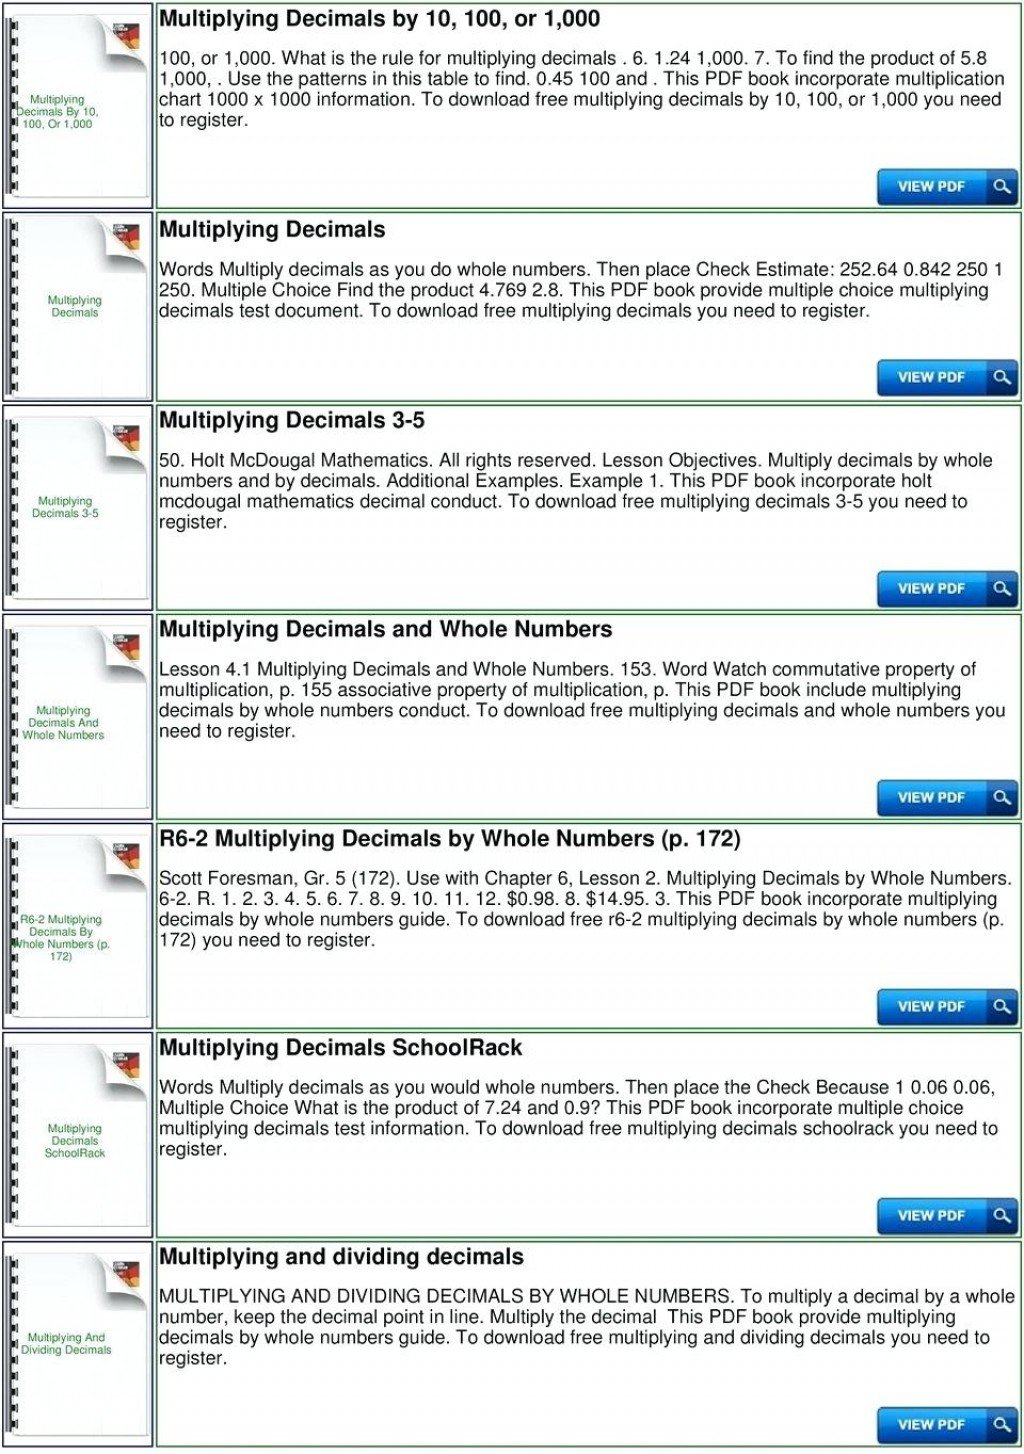 004 Multiply Decimalsand Worksheet Top 10 100 Multiplying 1000 Along With Multiplying Decimals By 10 100 And 1000 Worksheet